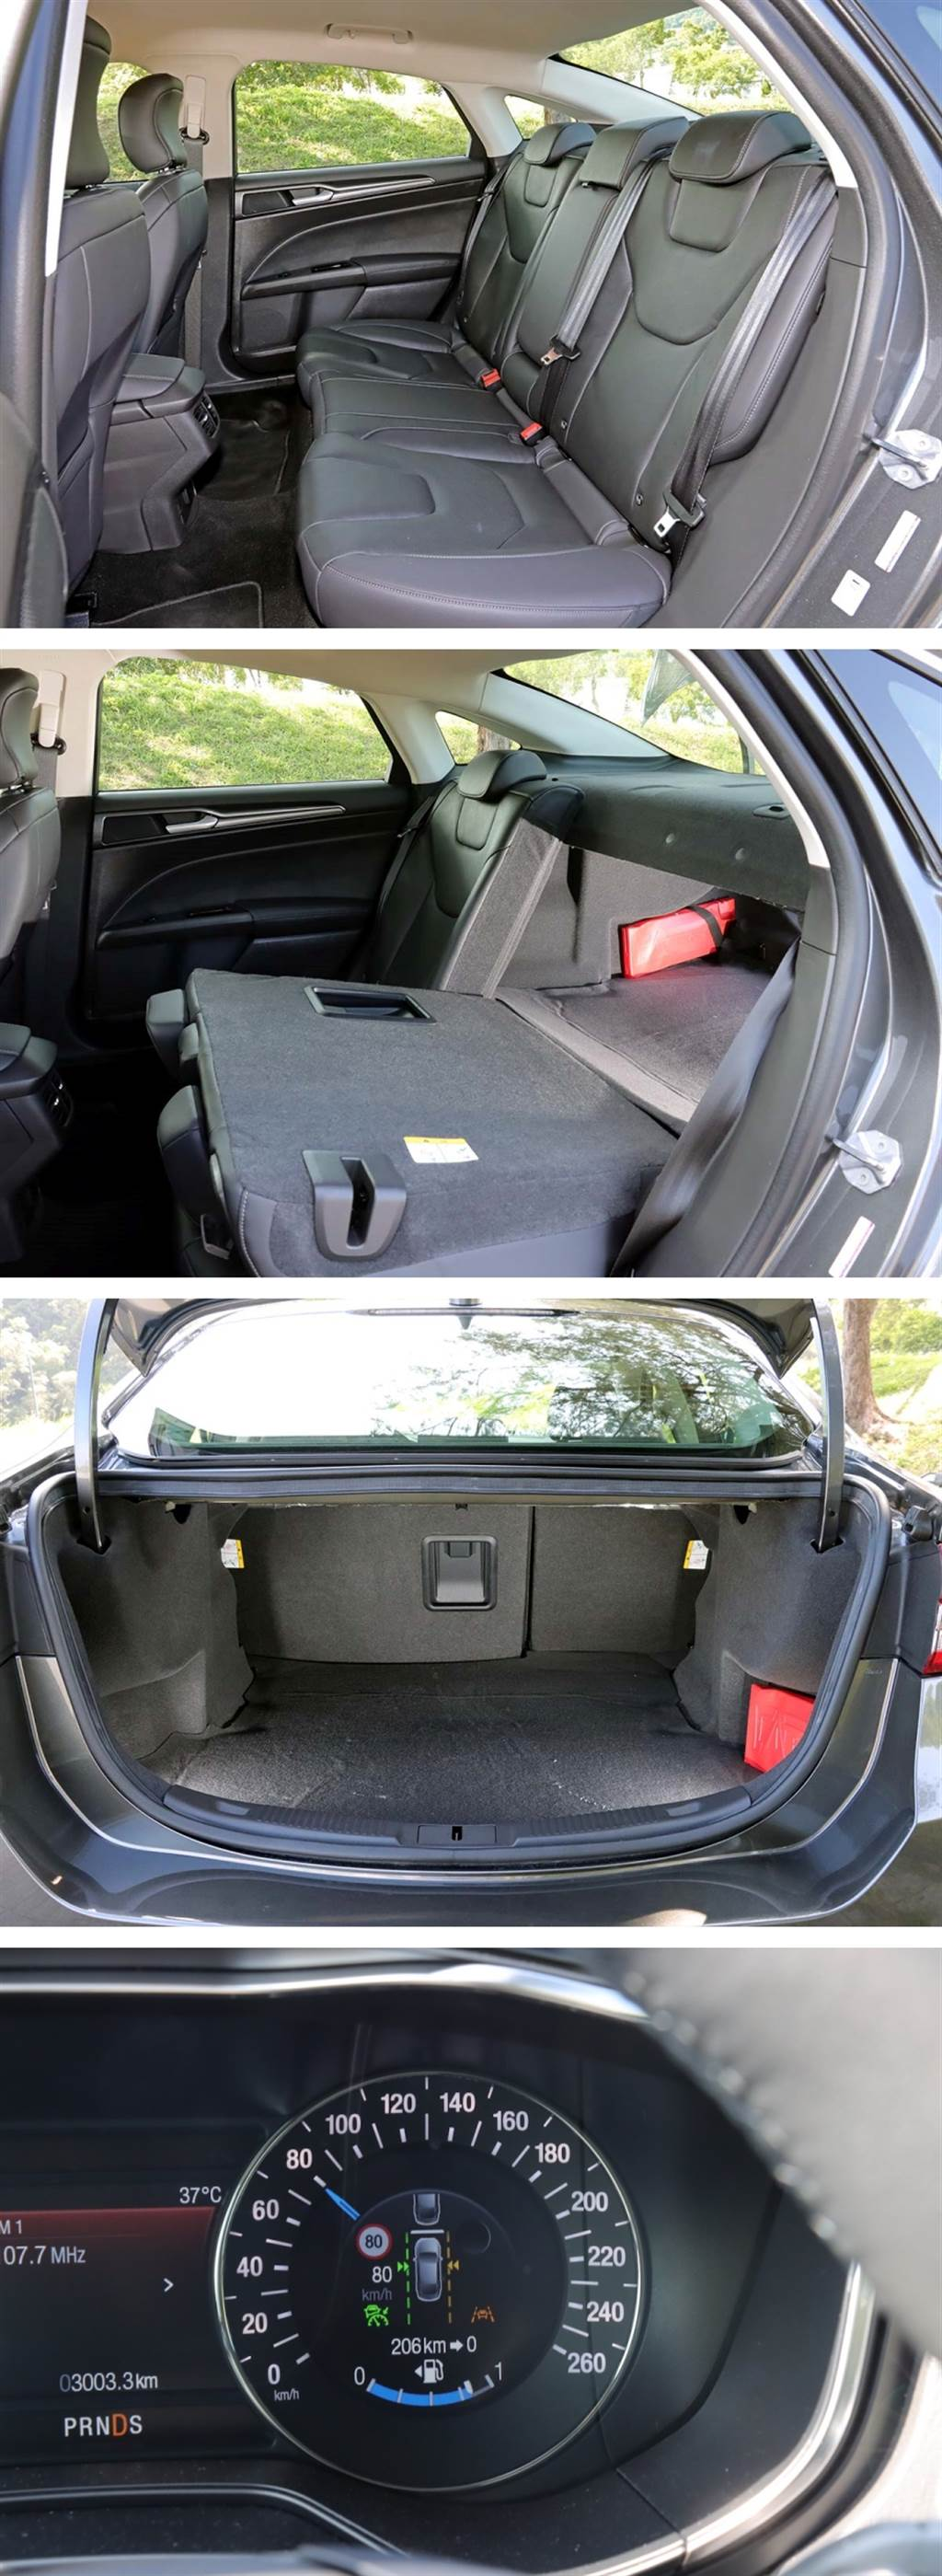 敬,那最後且美好的房車年華!2020 Ford Mondeo Sedan 2.0 EcoBoost 珍藏型